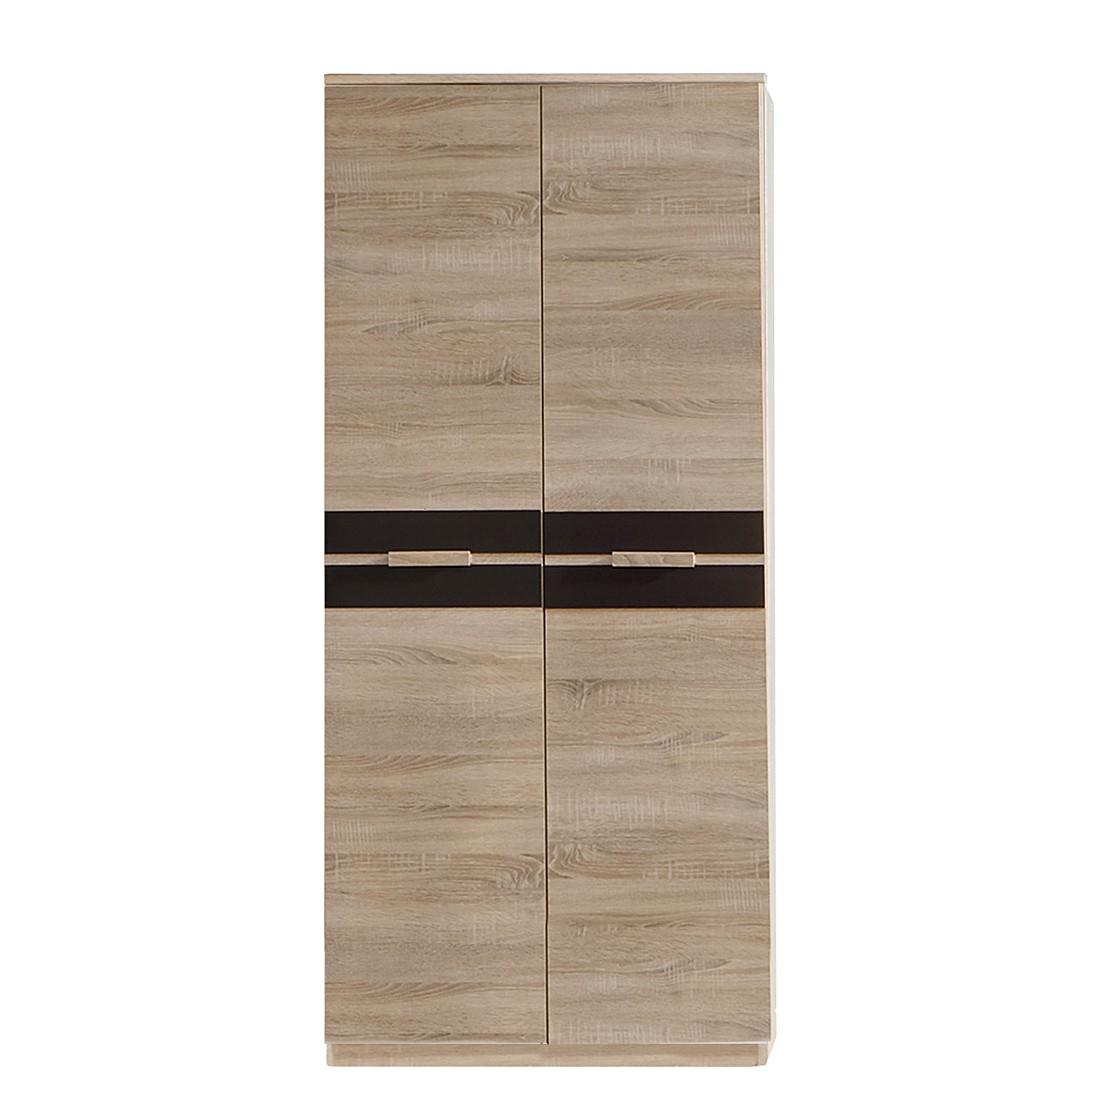 Kledingkast Fame (2-deurs) - grof gezaagde eikenhouten look/lavasteenkleurig, Wimex